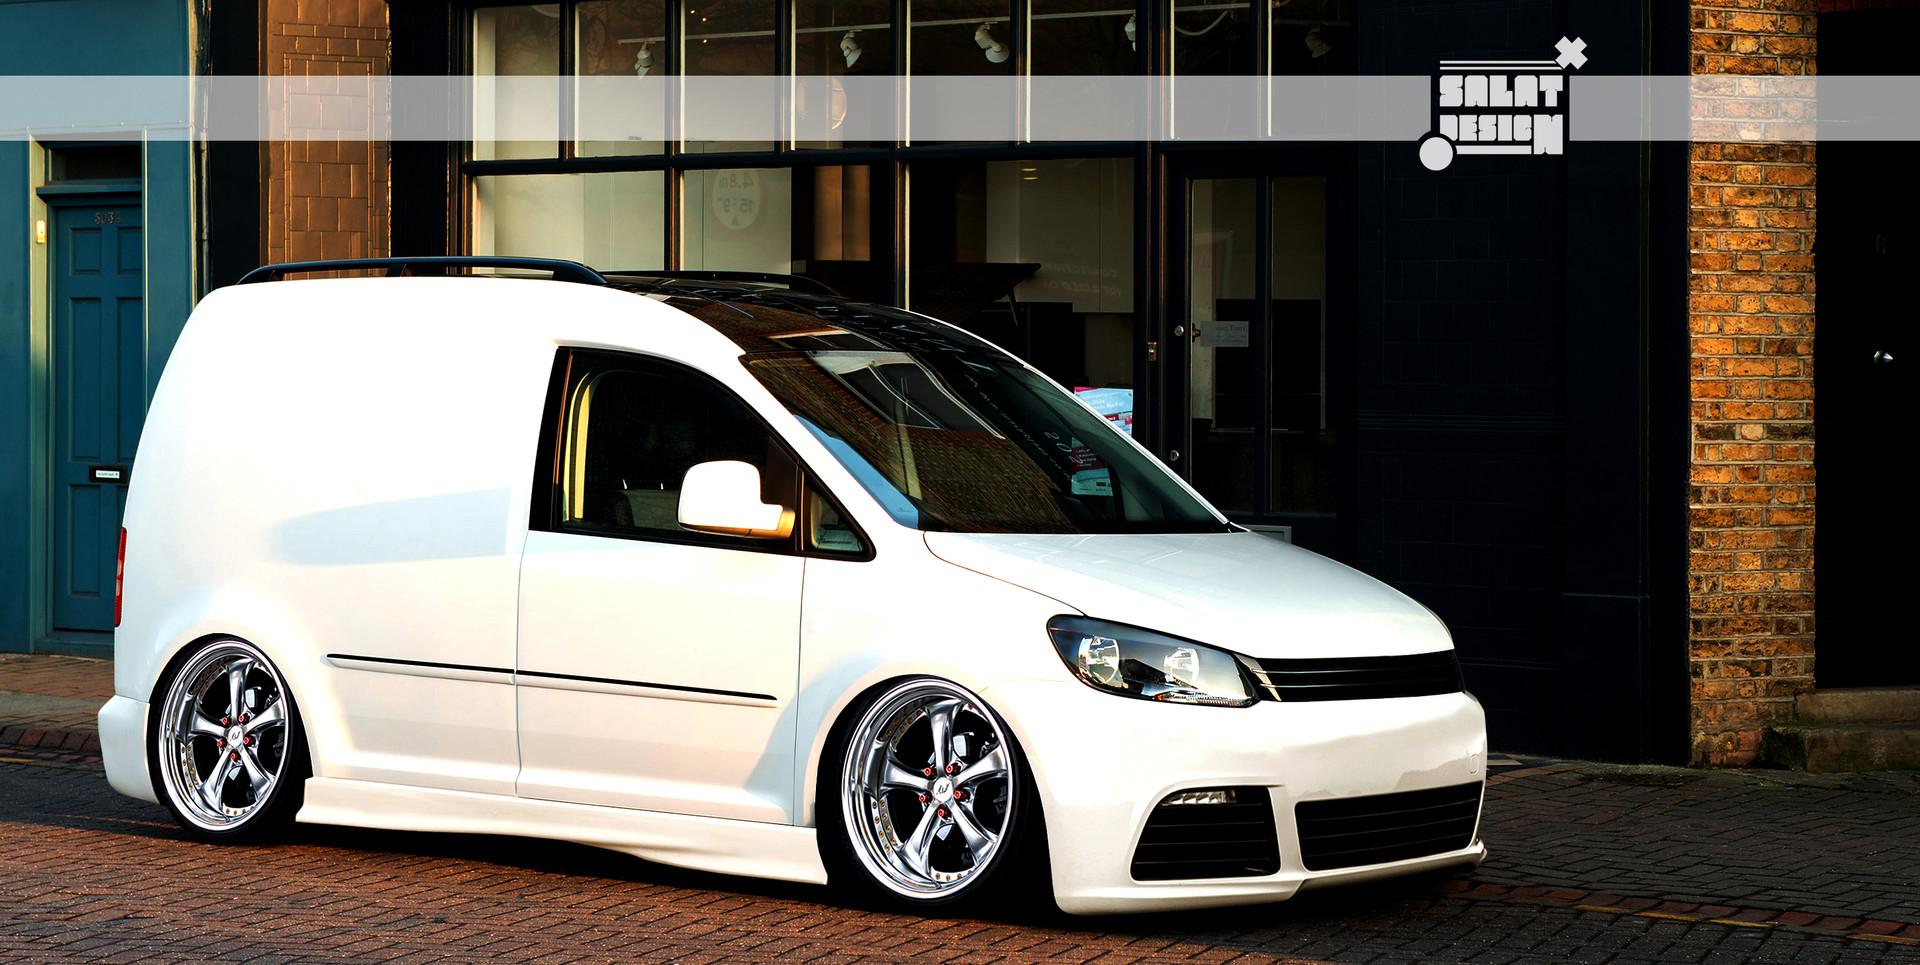 ArtStation - VW Caddy R-edition GermanStyle, Srdjan Salat